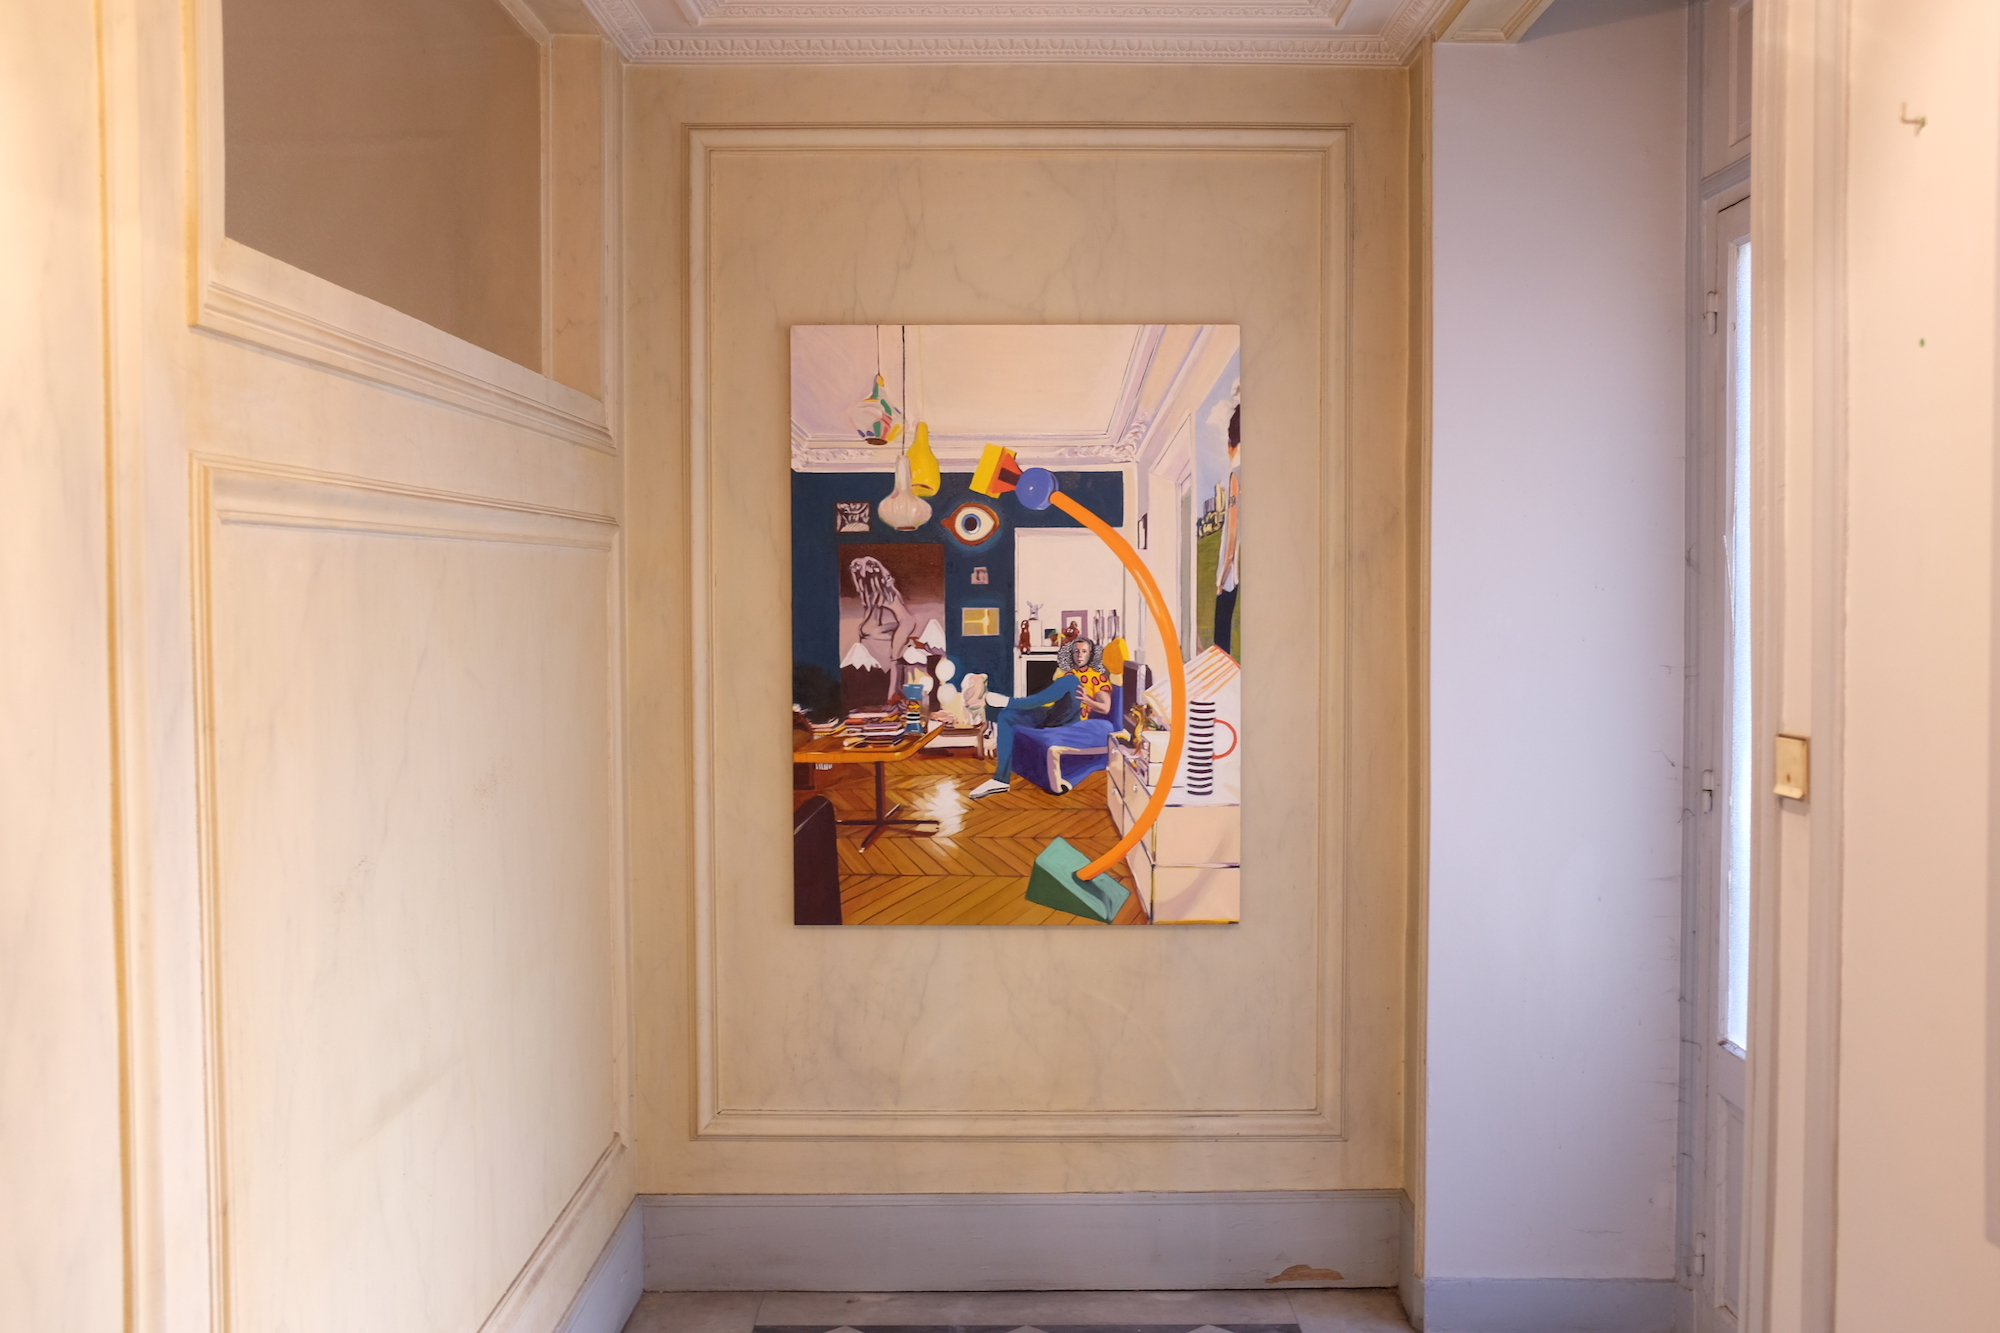 paul mouginot_L Anti Destin_exhibition_C-01